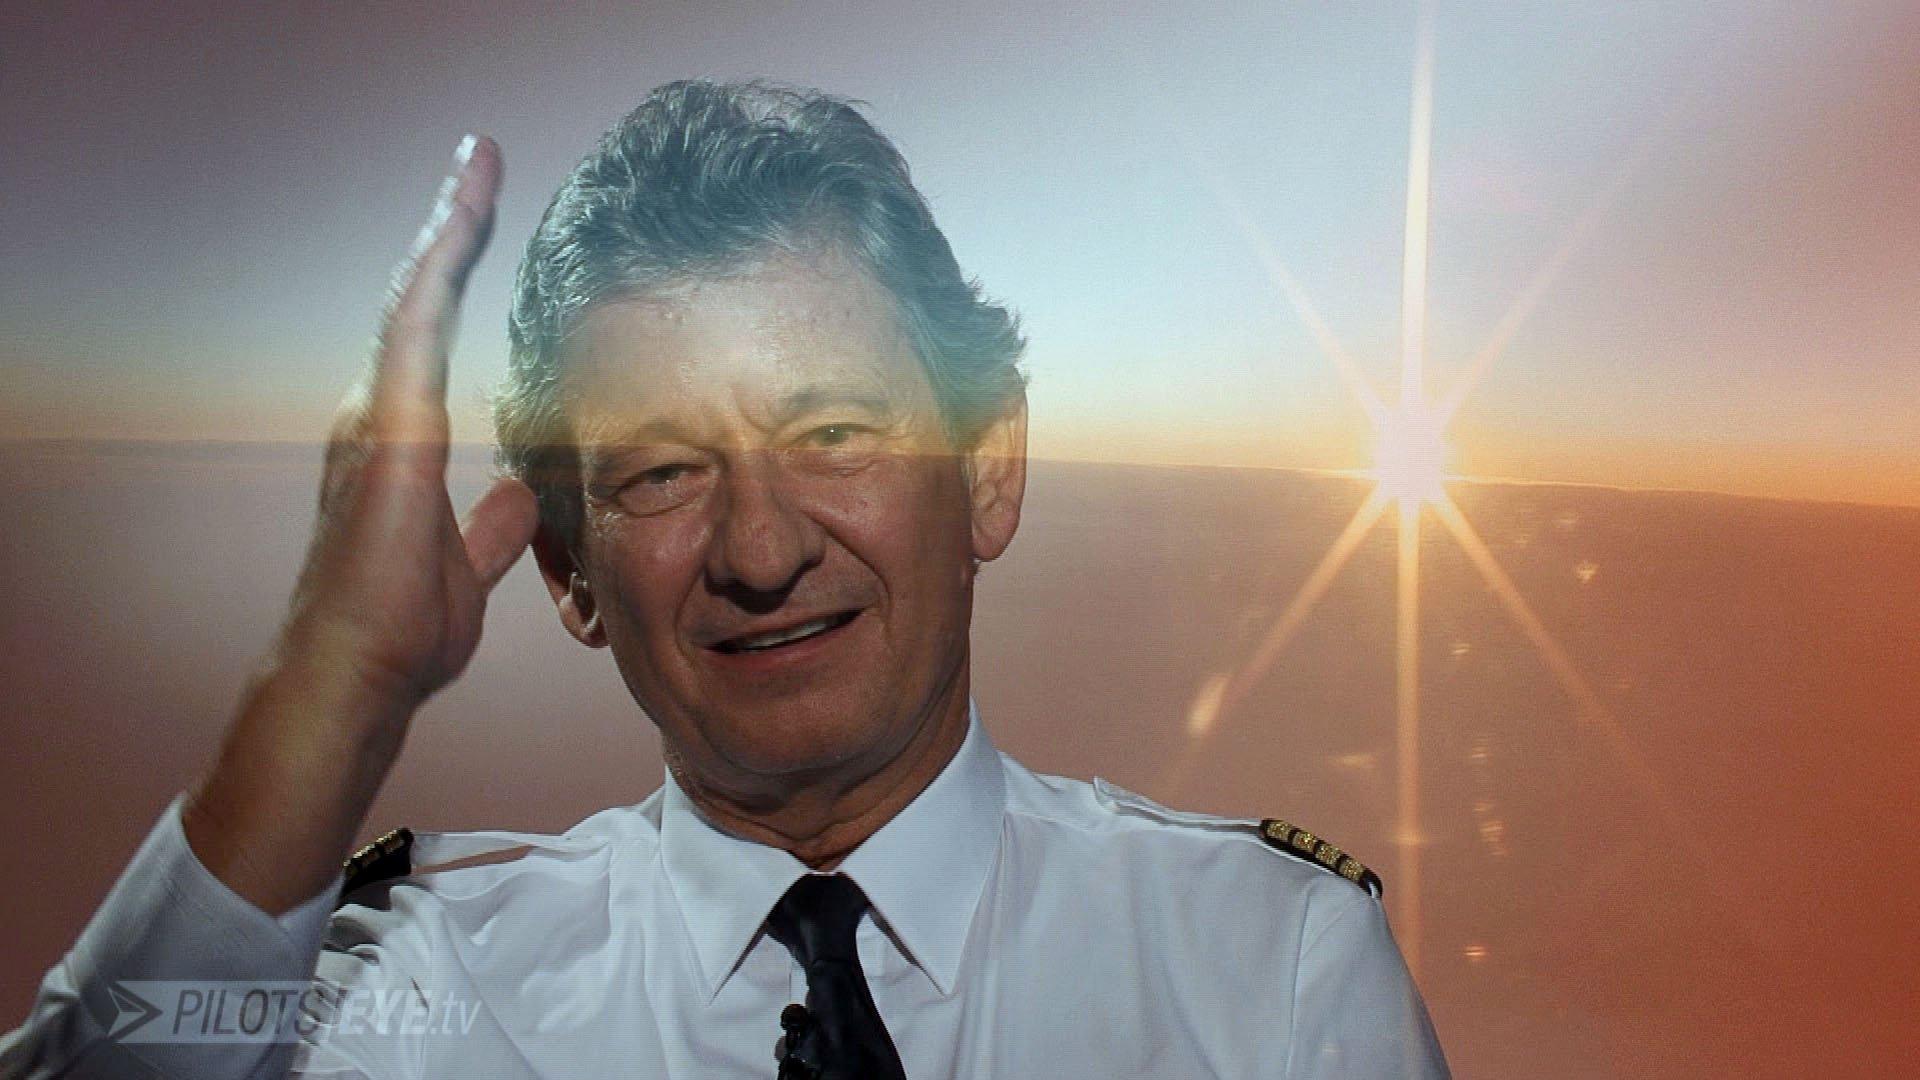 PilotsEYE.tv | LOS ANGELES |:| Blu-ray Disc® |:| Cockpitflug Lufthansa | Boeing 747 | Der letzte Flug des Leitwolfes... by